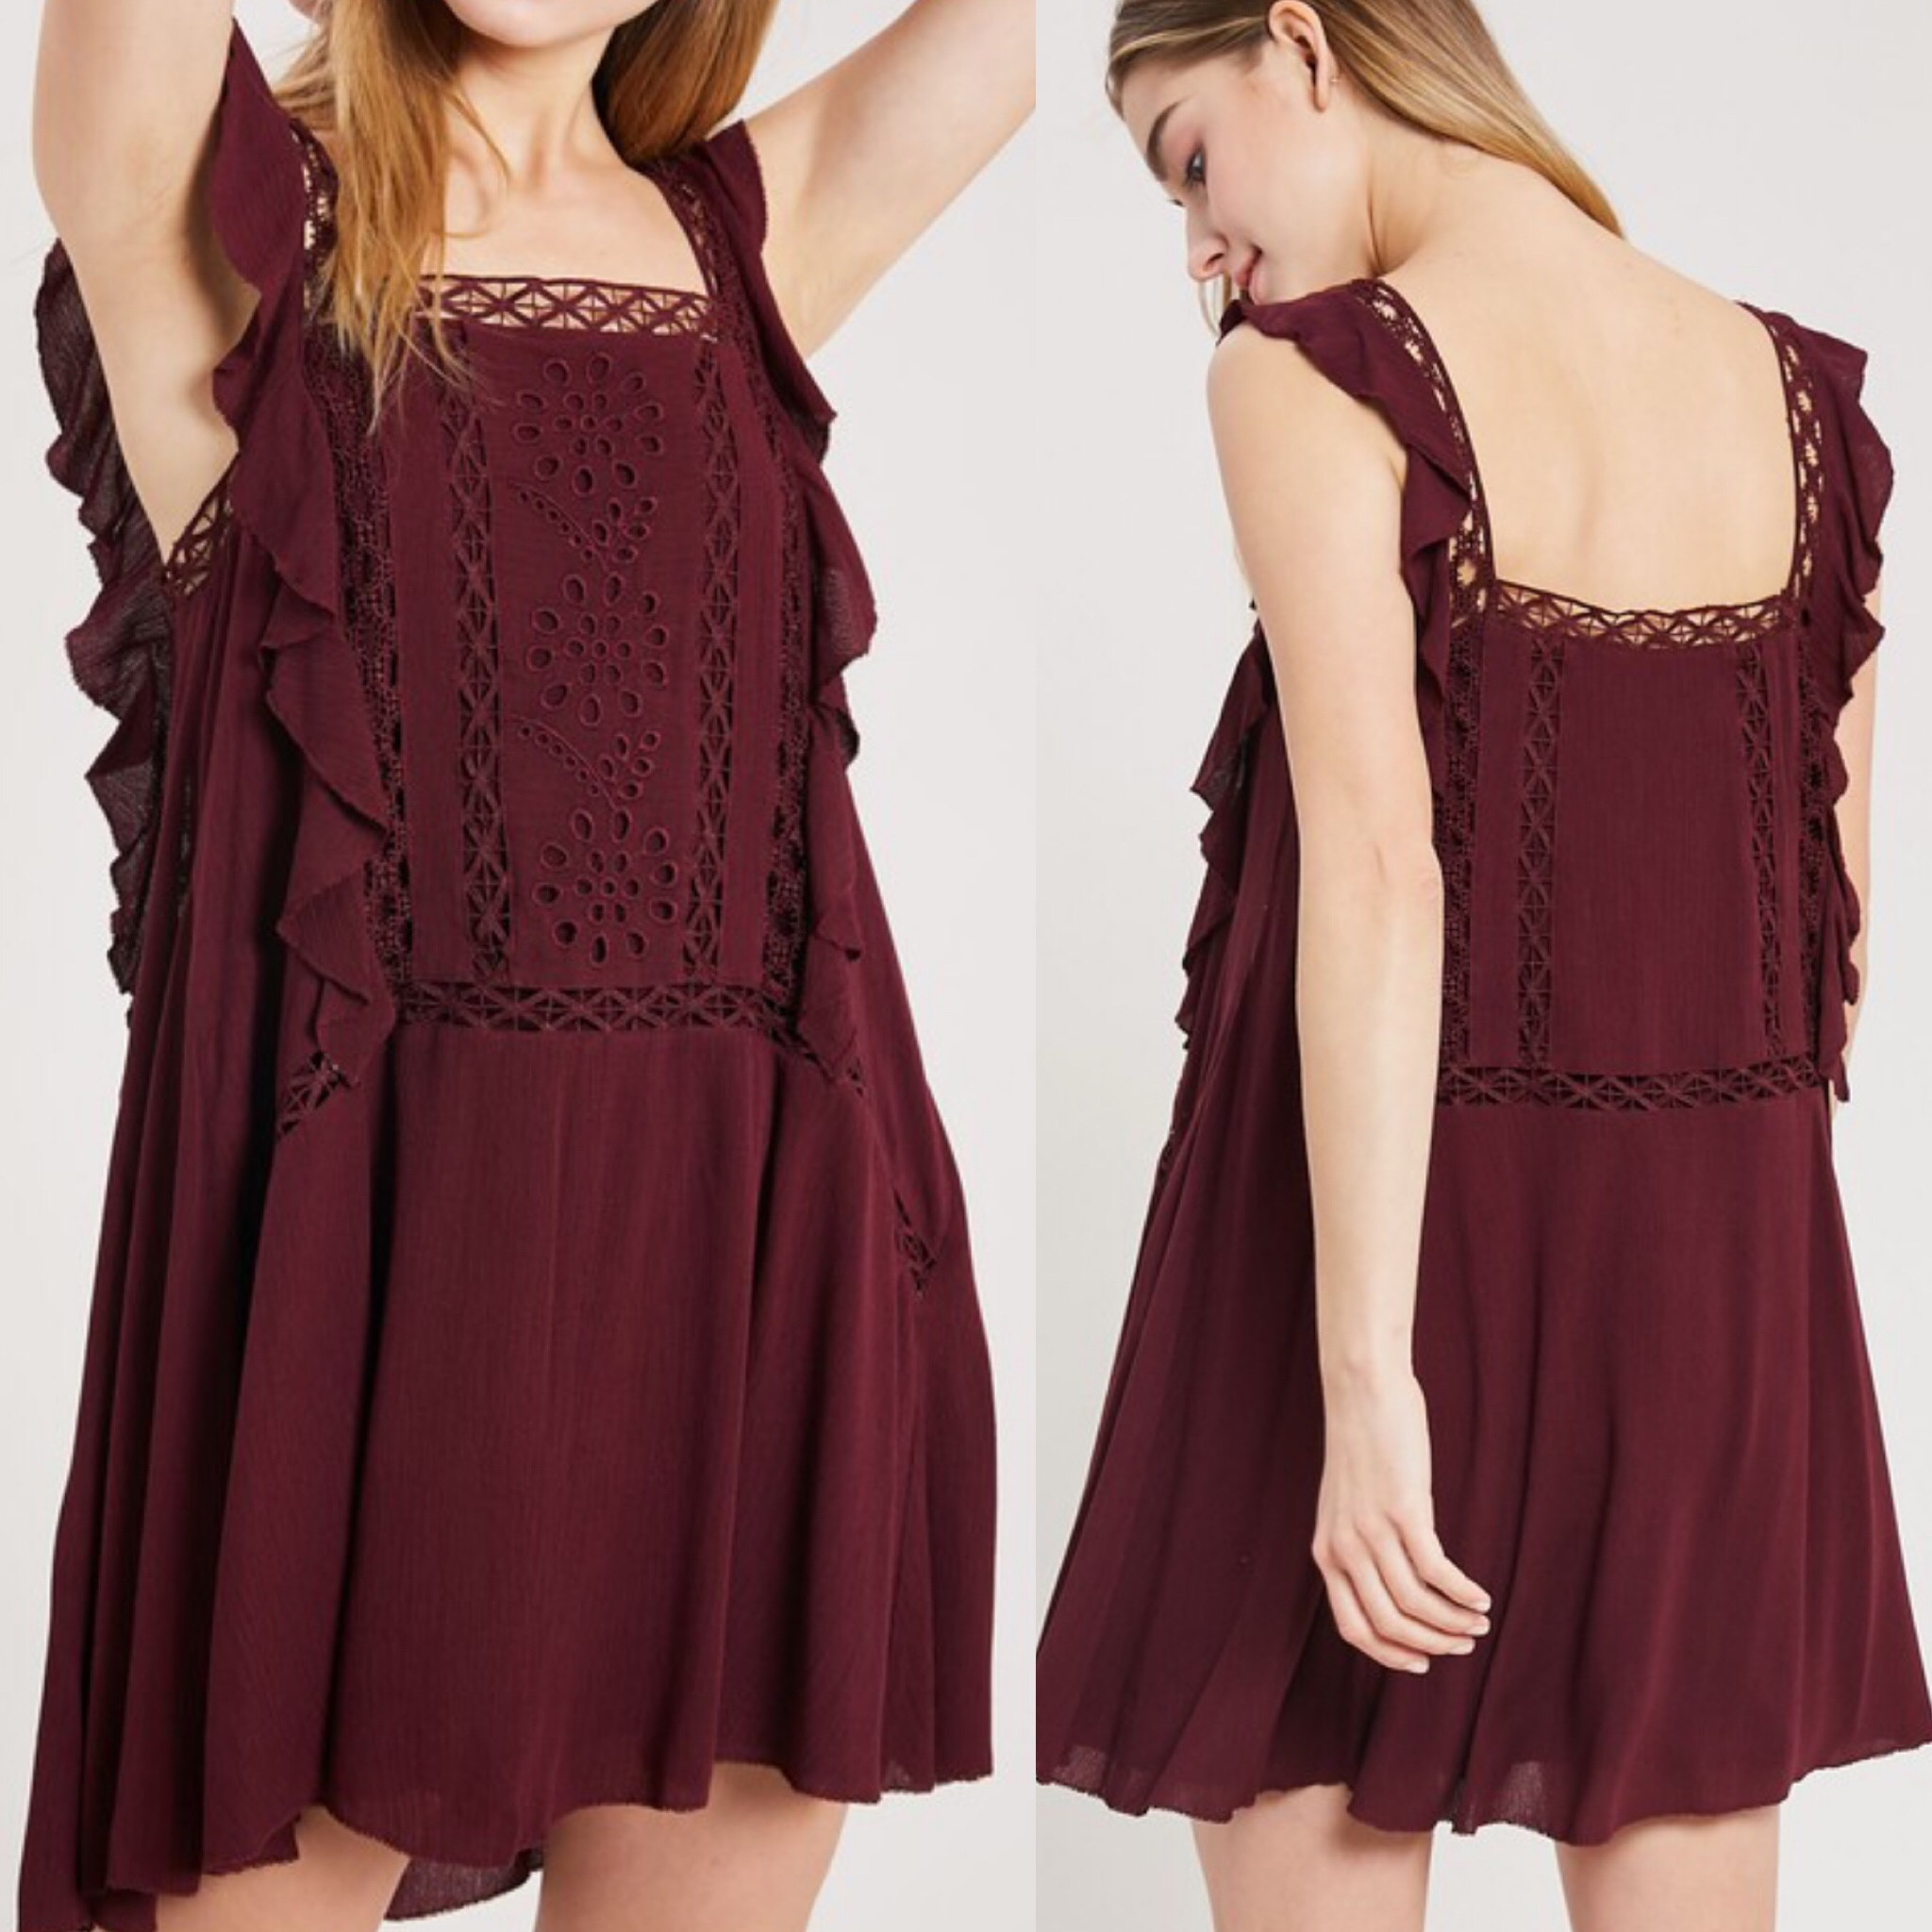 Crochet Detail Boho Dress - Wine